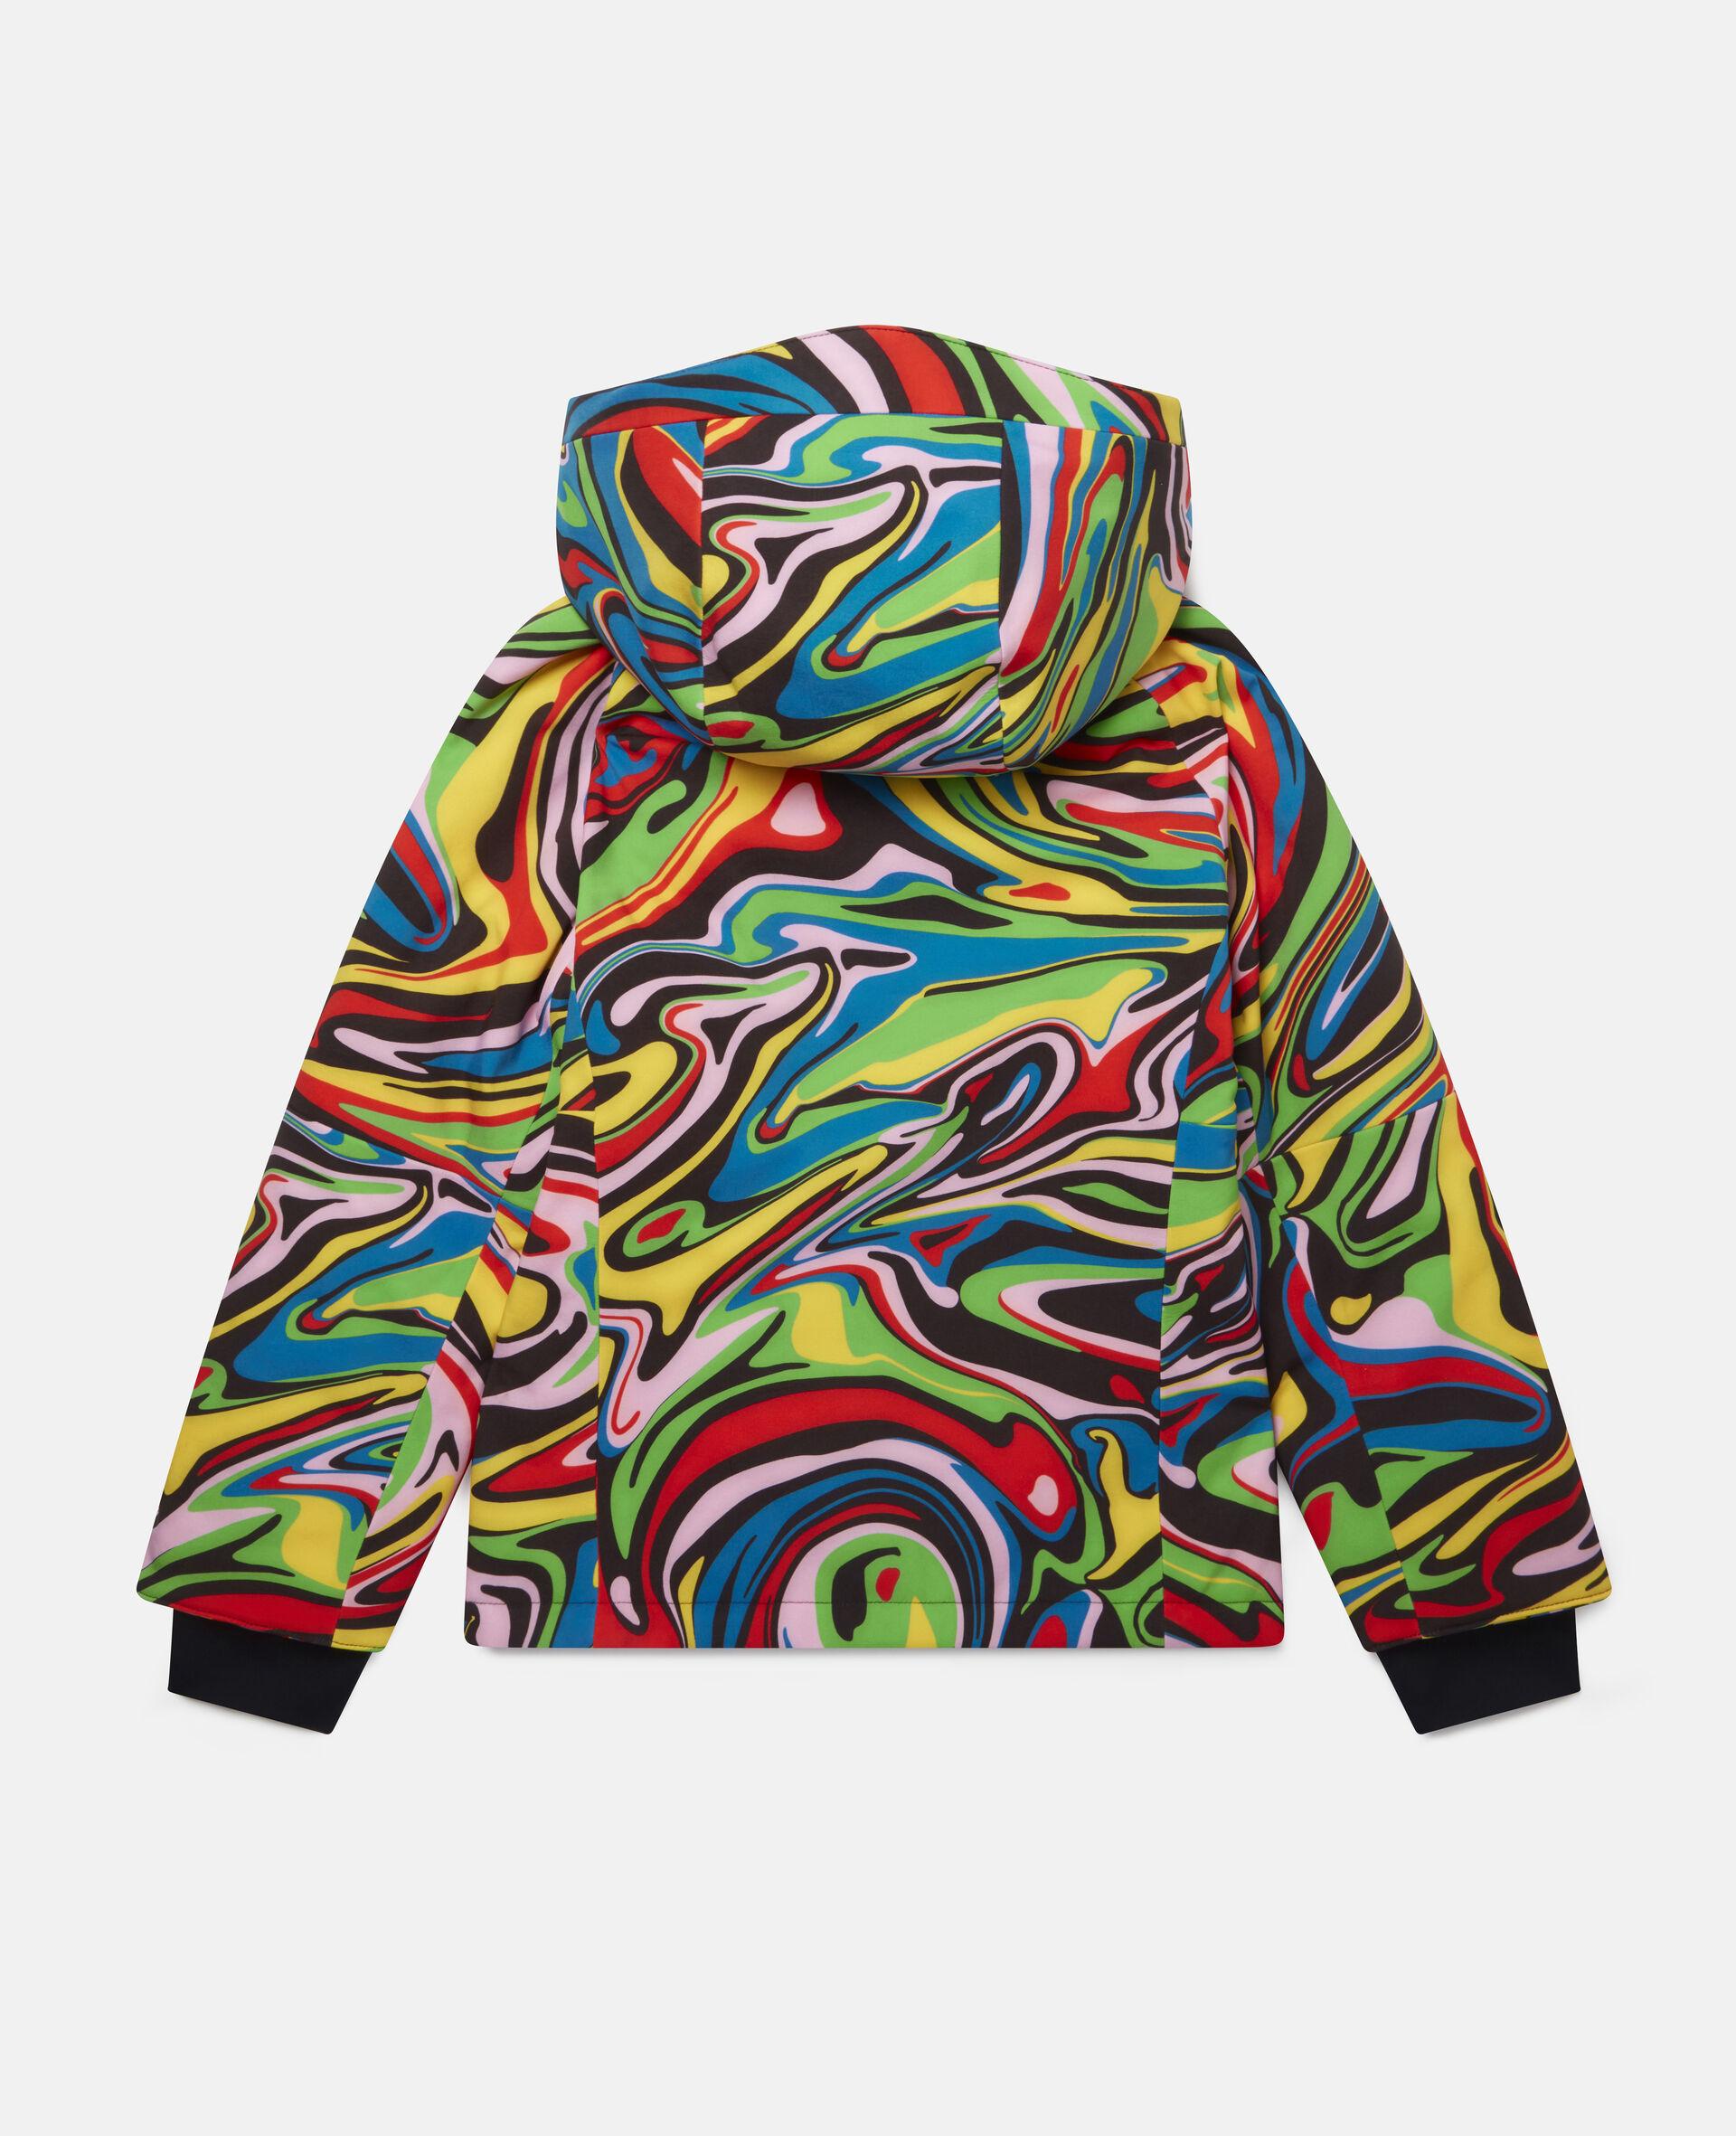 Marble Ski Jacket-Multicolour-large image number 3